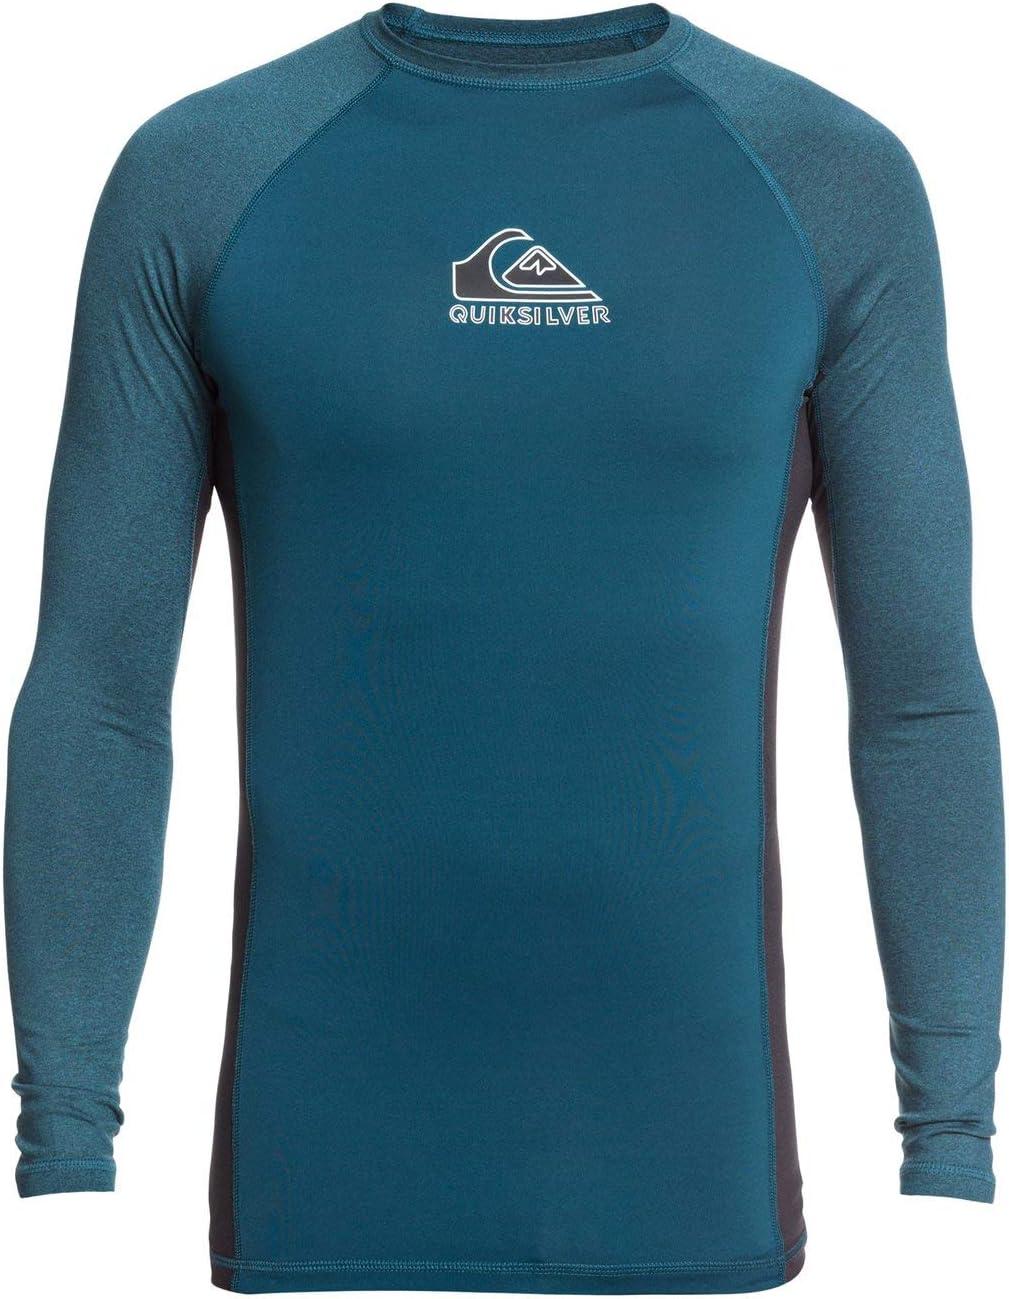 Quiksilver Backwash-Rash Vest UPF 50 A Maniche Lunghe da Uomo